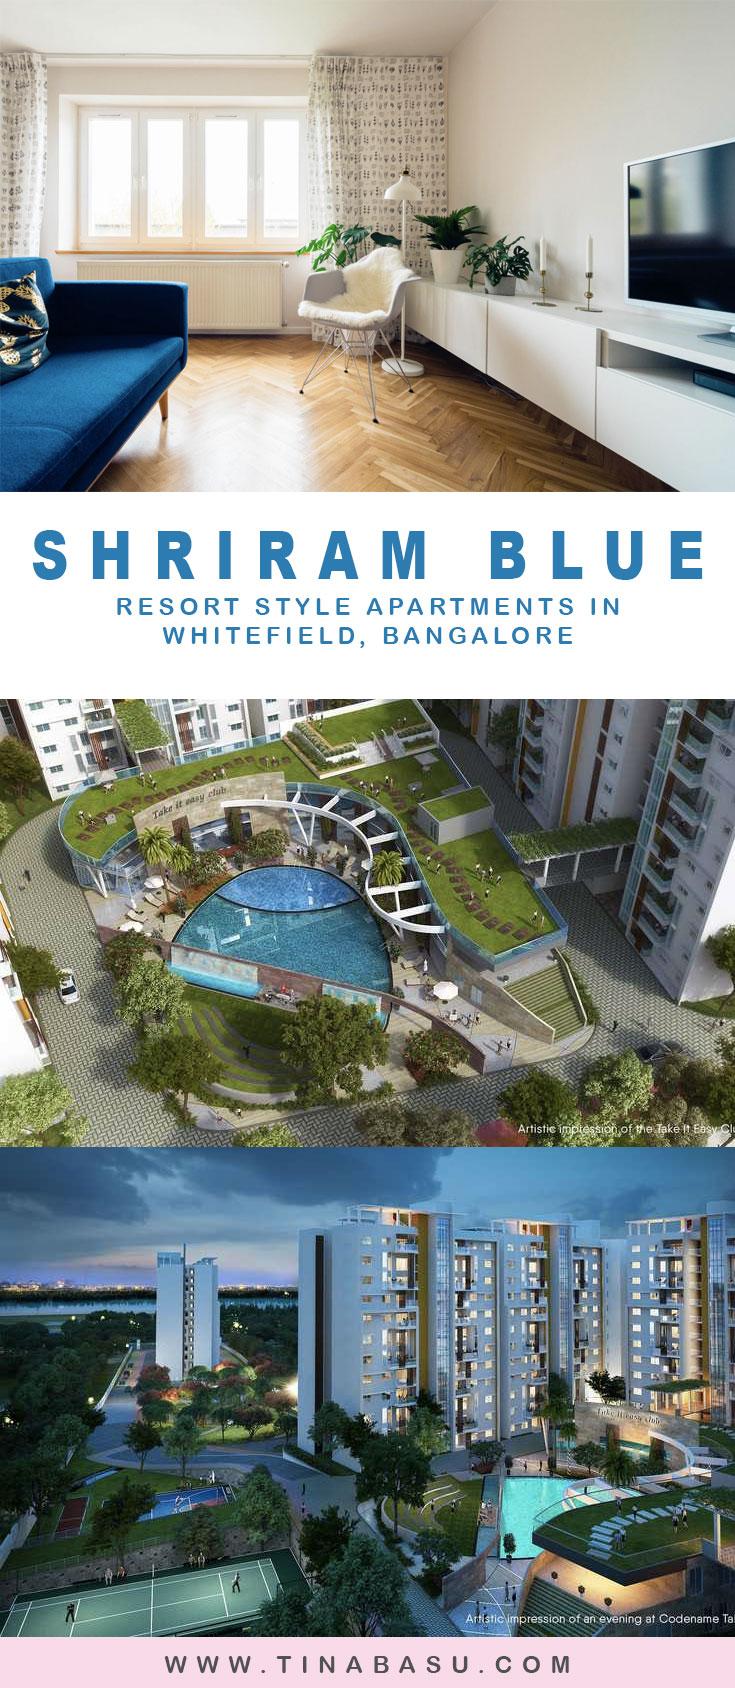 shriram blue appartments in bangalore